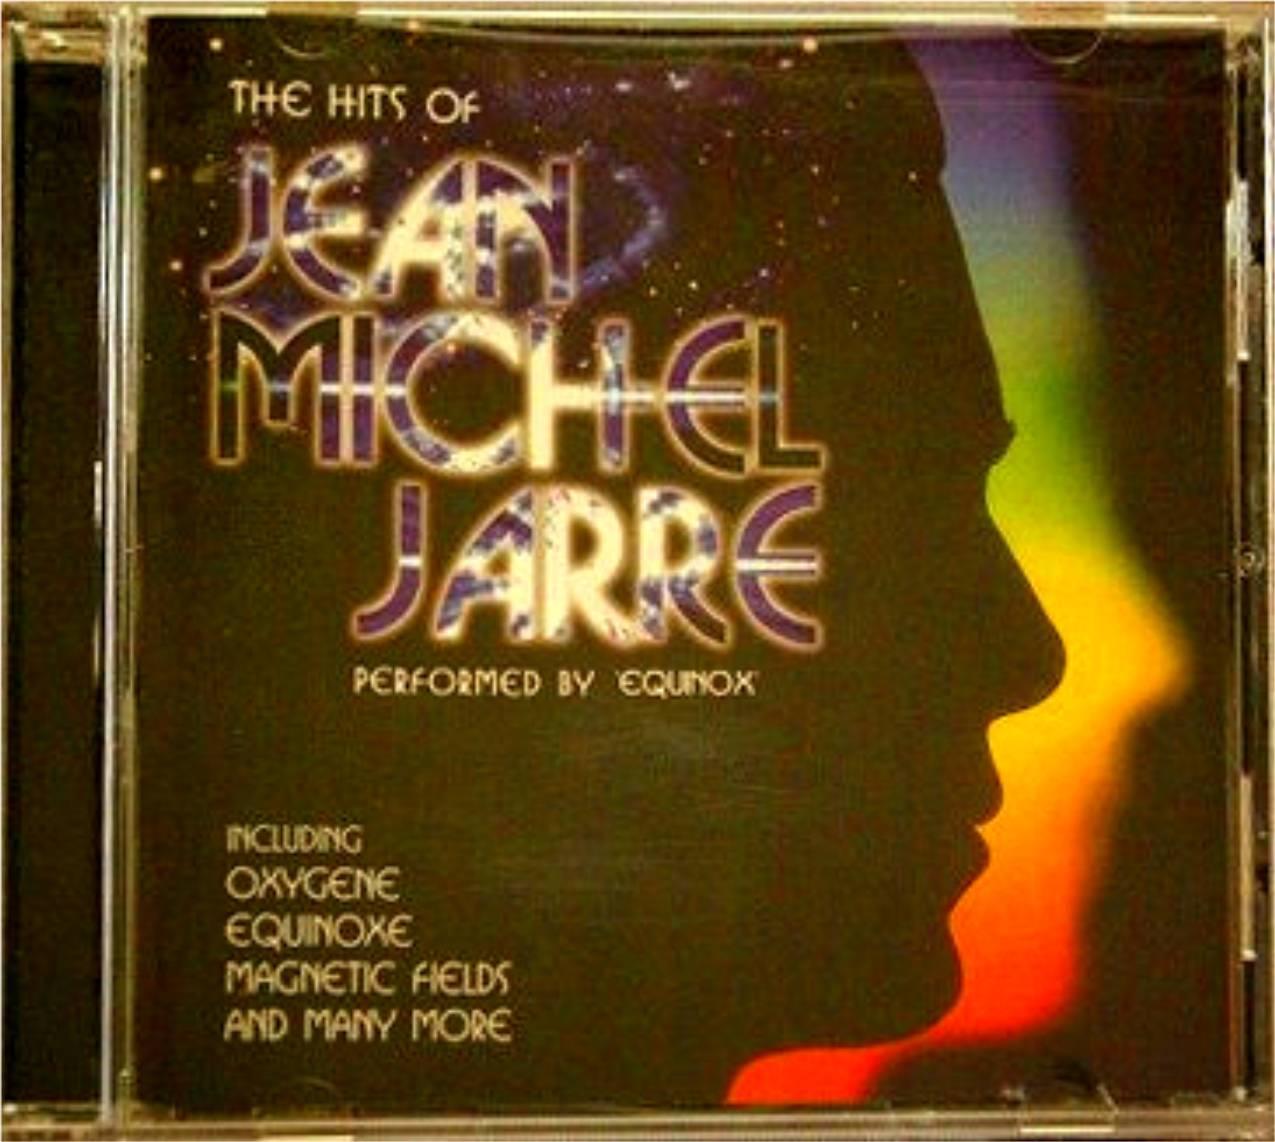 The Hits of Jean Michel Jarre